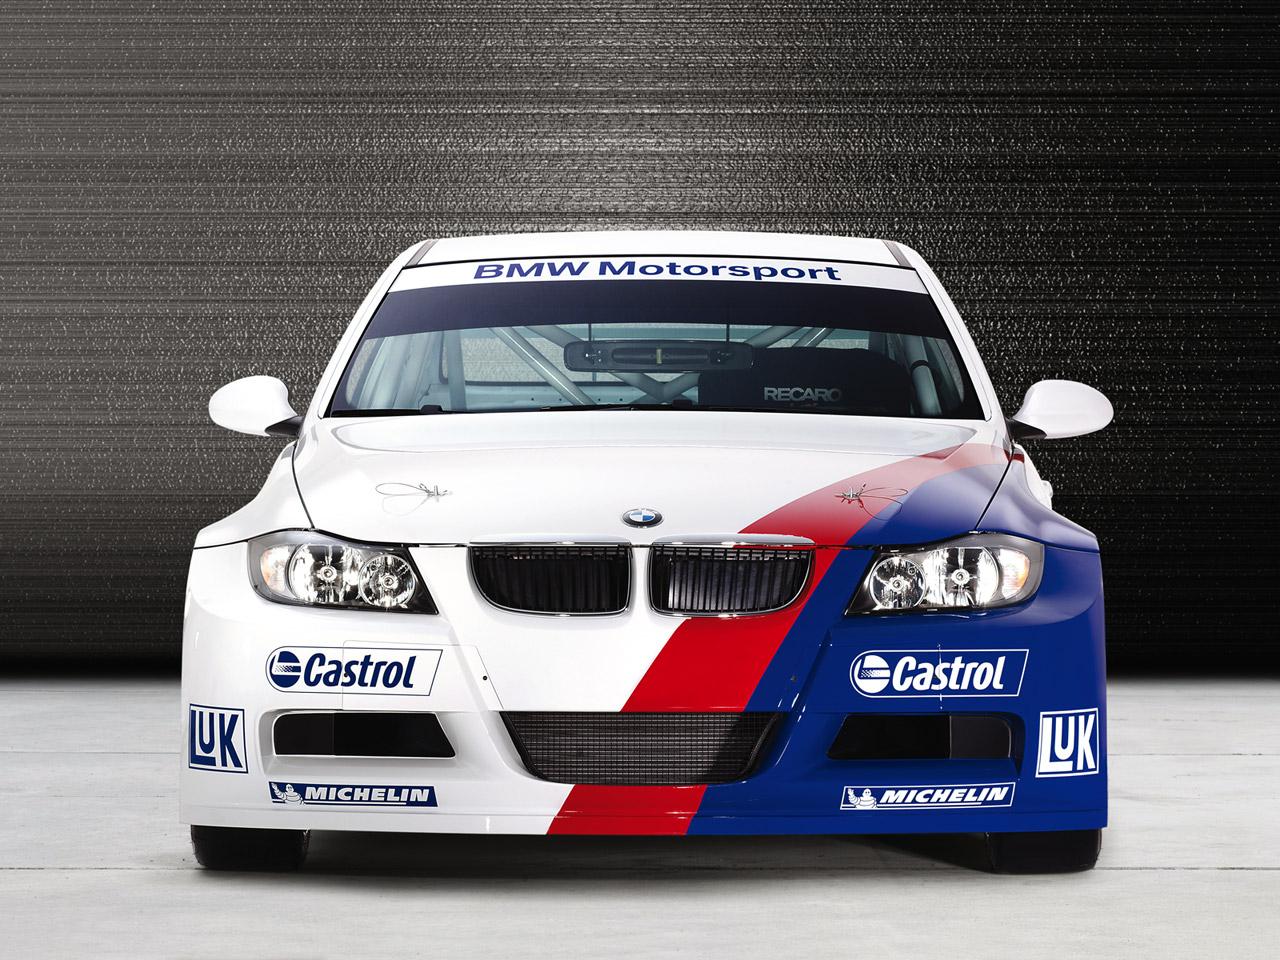 BMW 3-series WTCC photos - PhotoGallery with 11 pics| CarsBase.com